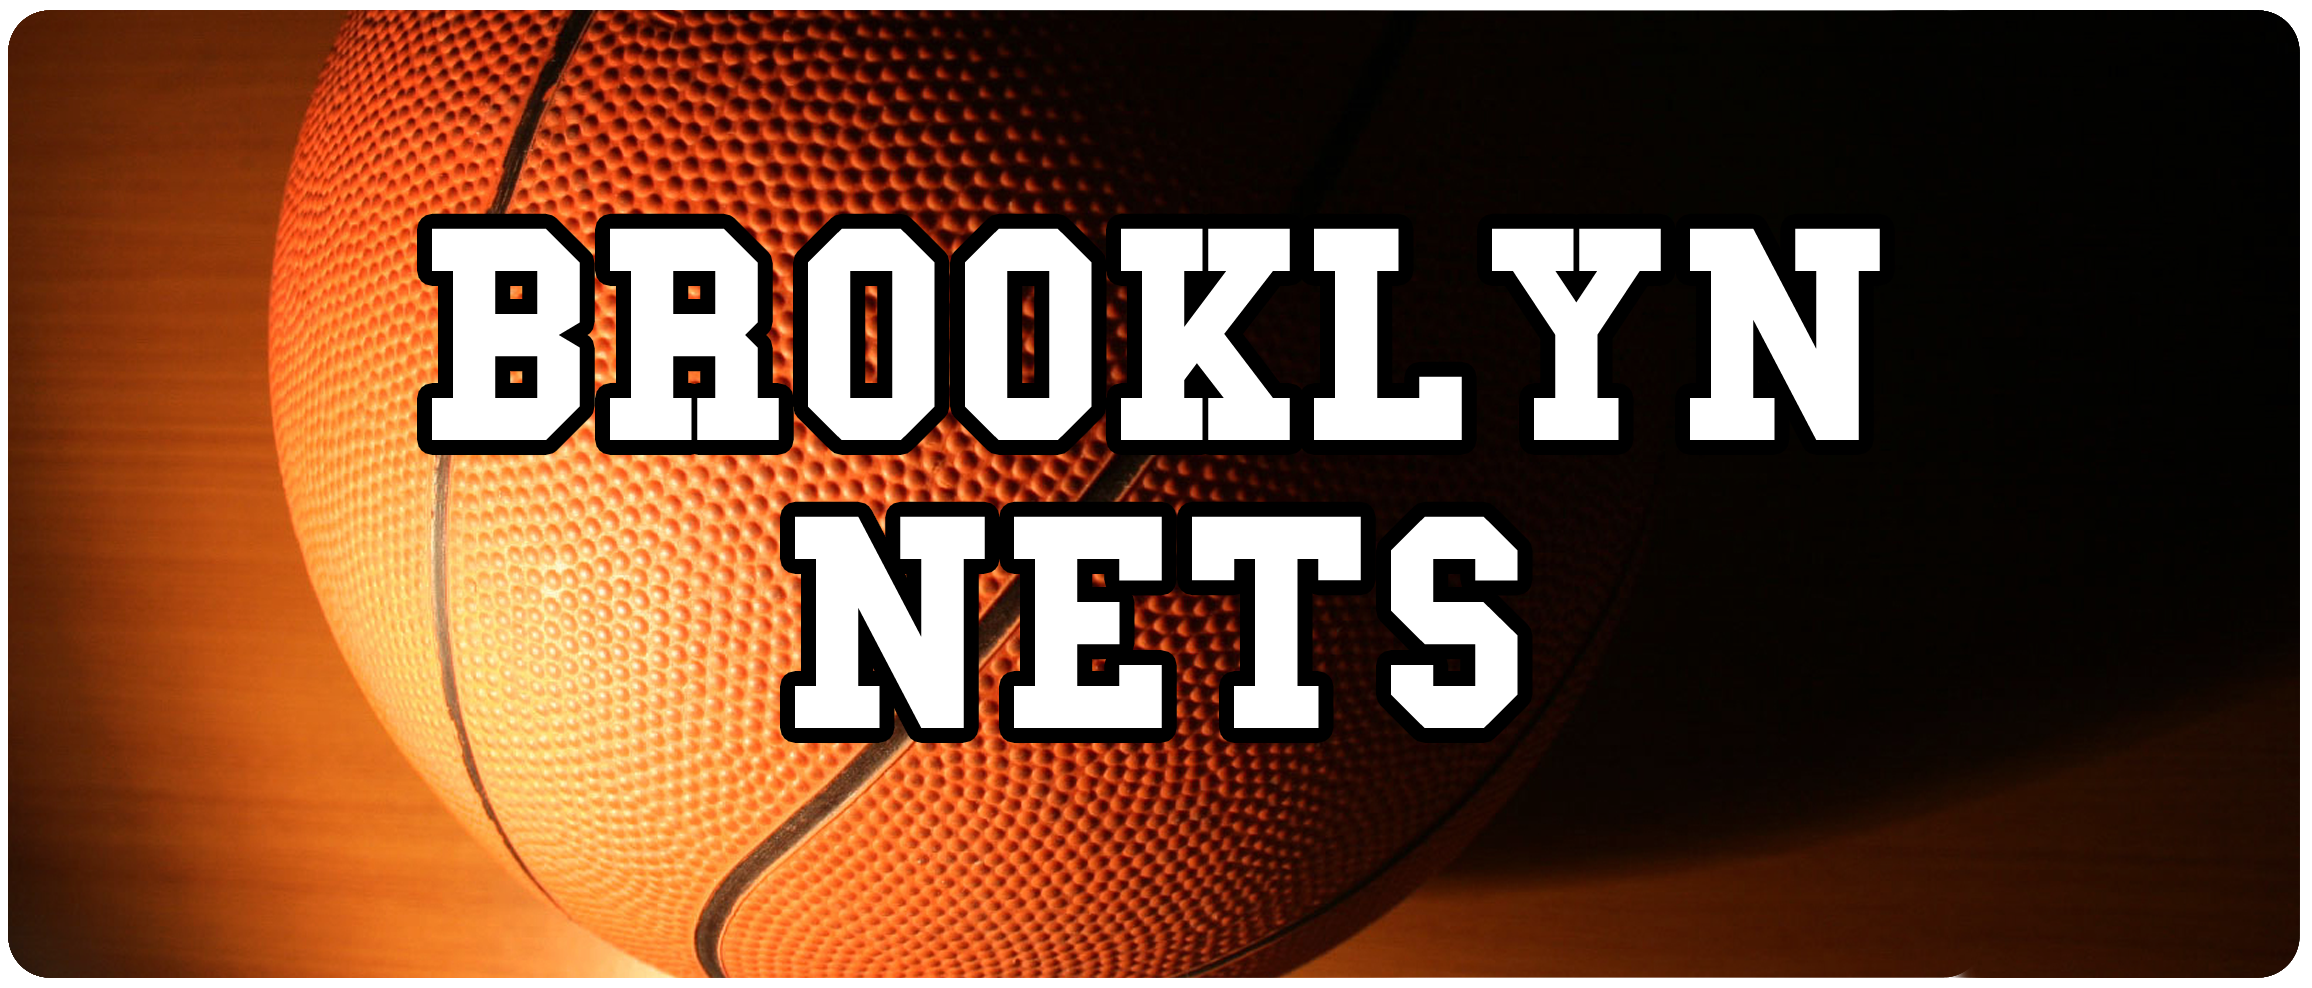 Nba Playoffs 2015 Ticket Prices | Basketball Scores